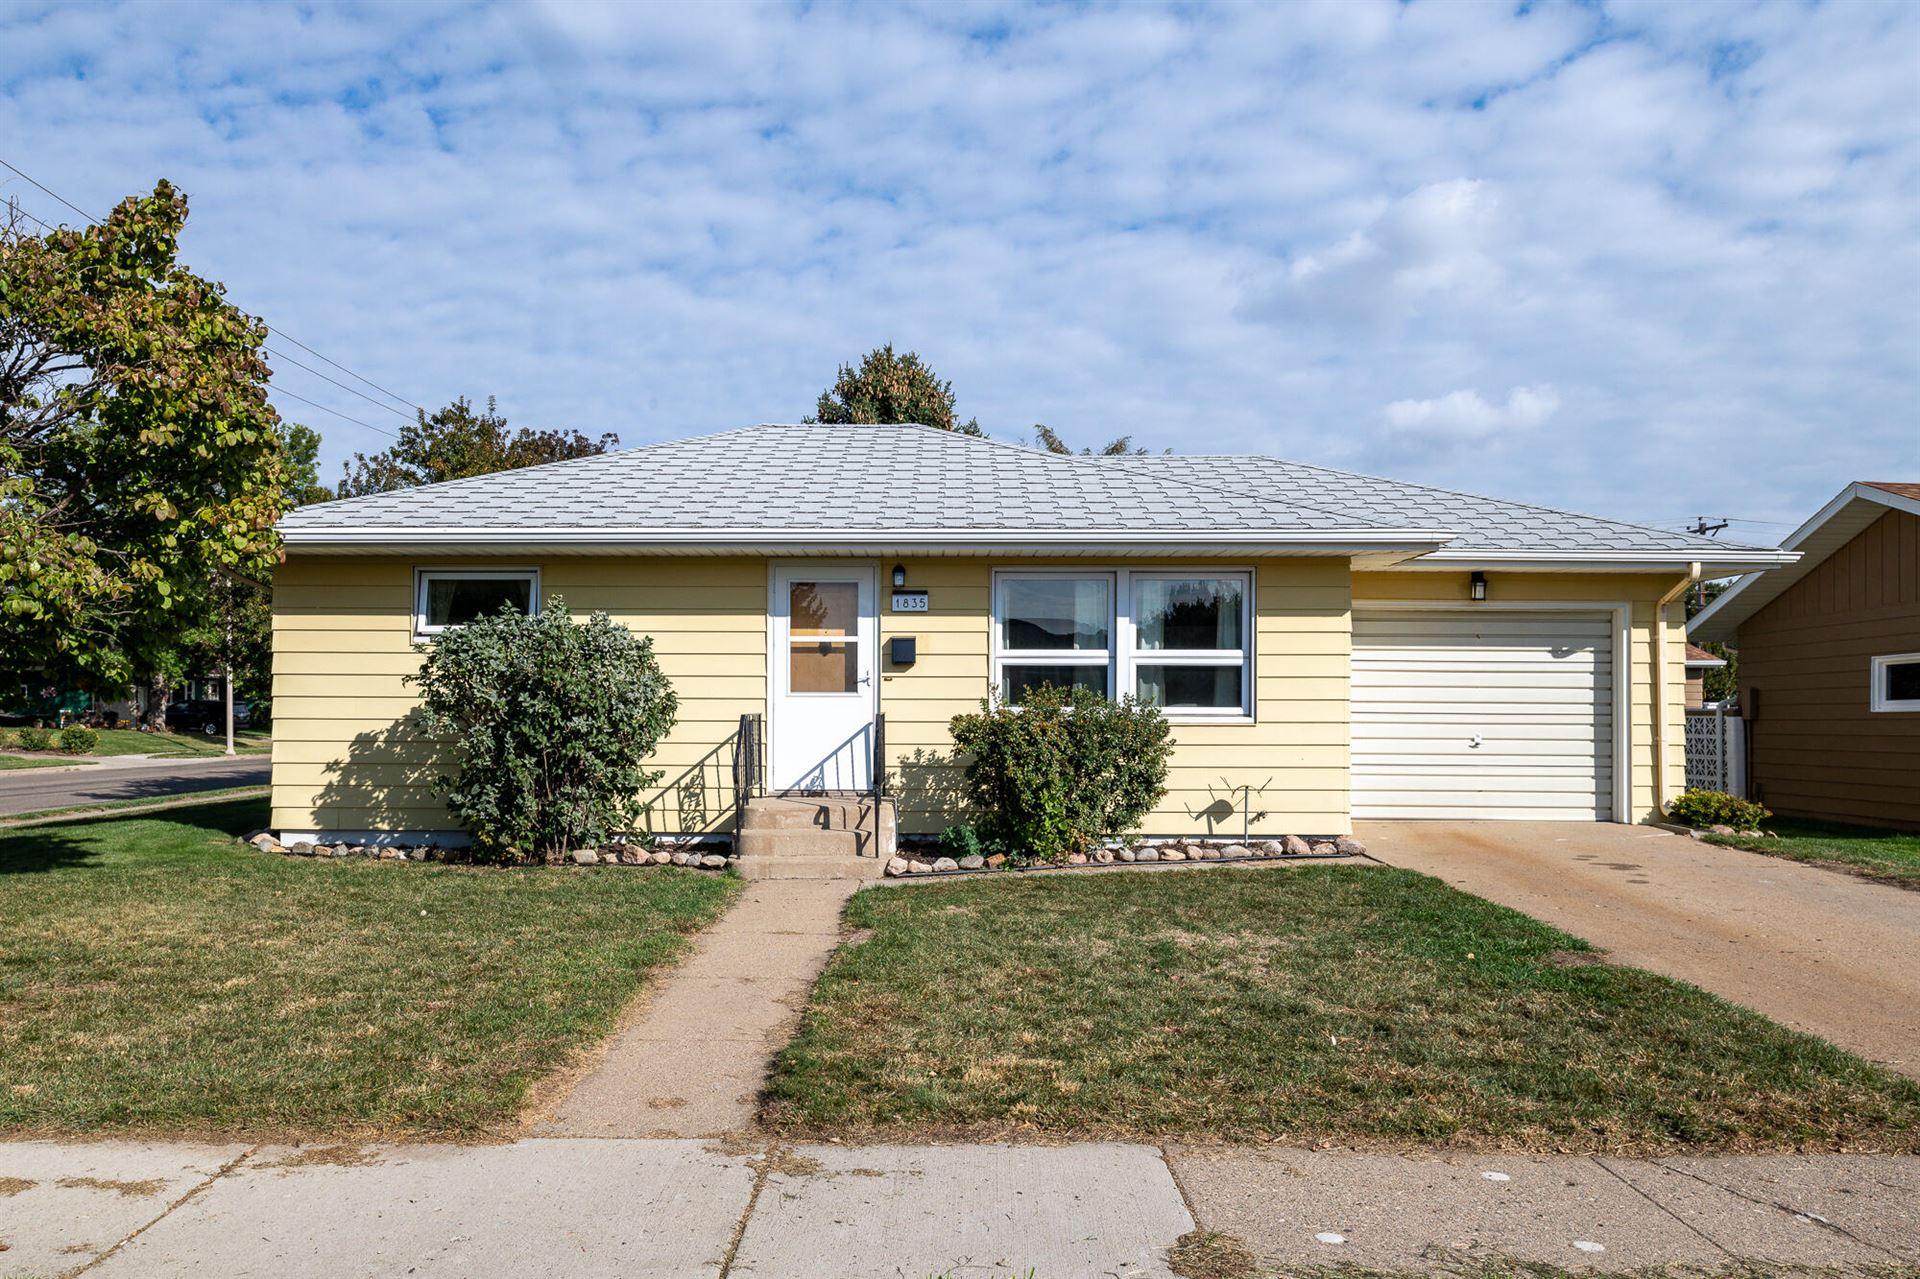 1835 7th Street, Bismarck, ND 58501 - #: 412373